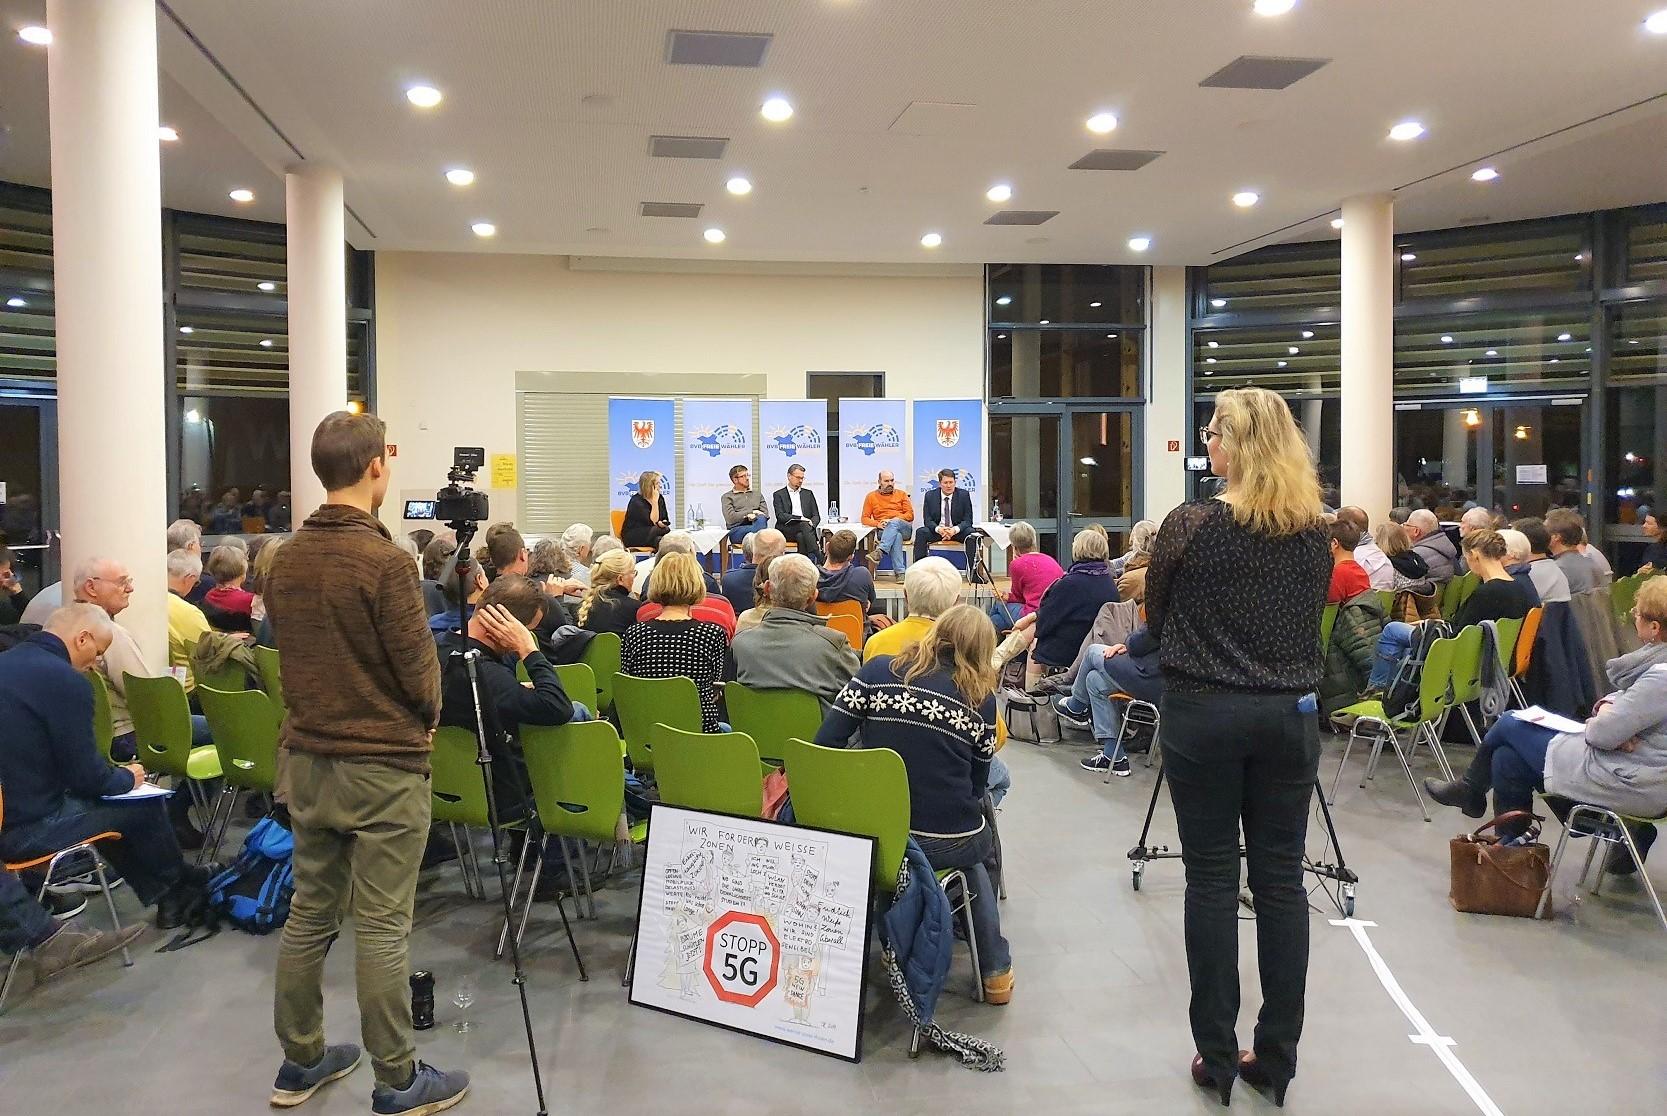 Podiumsdiskussion in Bernau zum Thema 5G